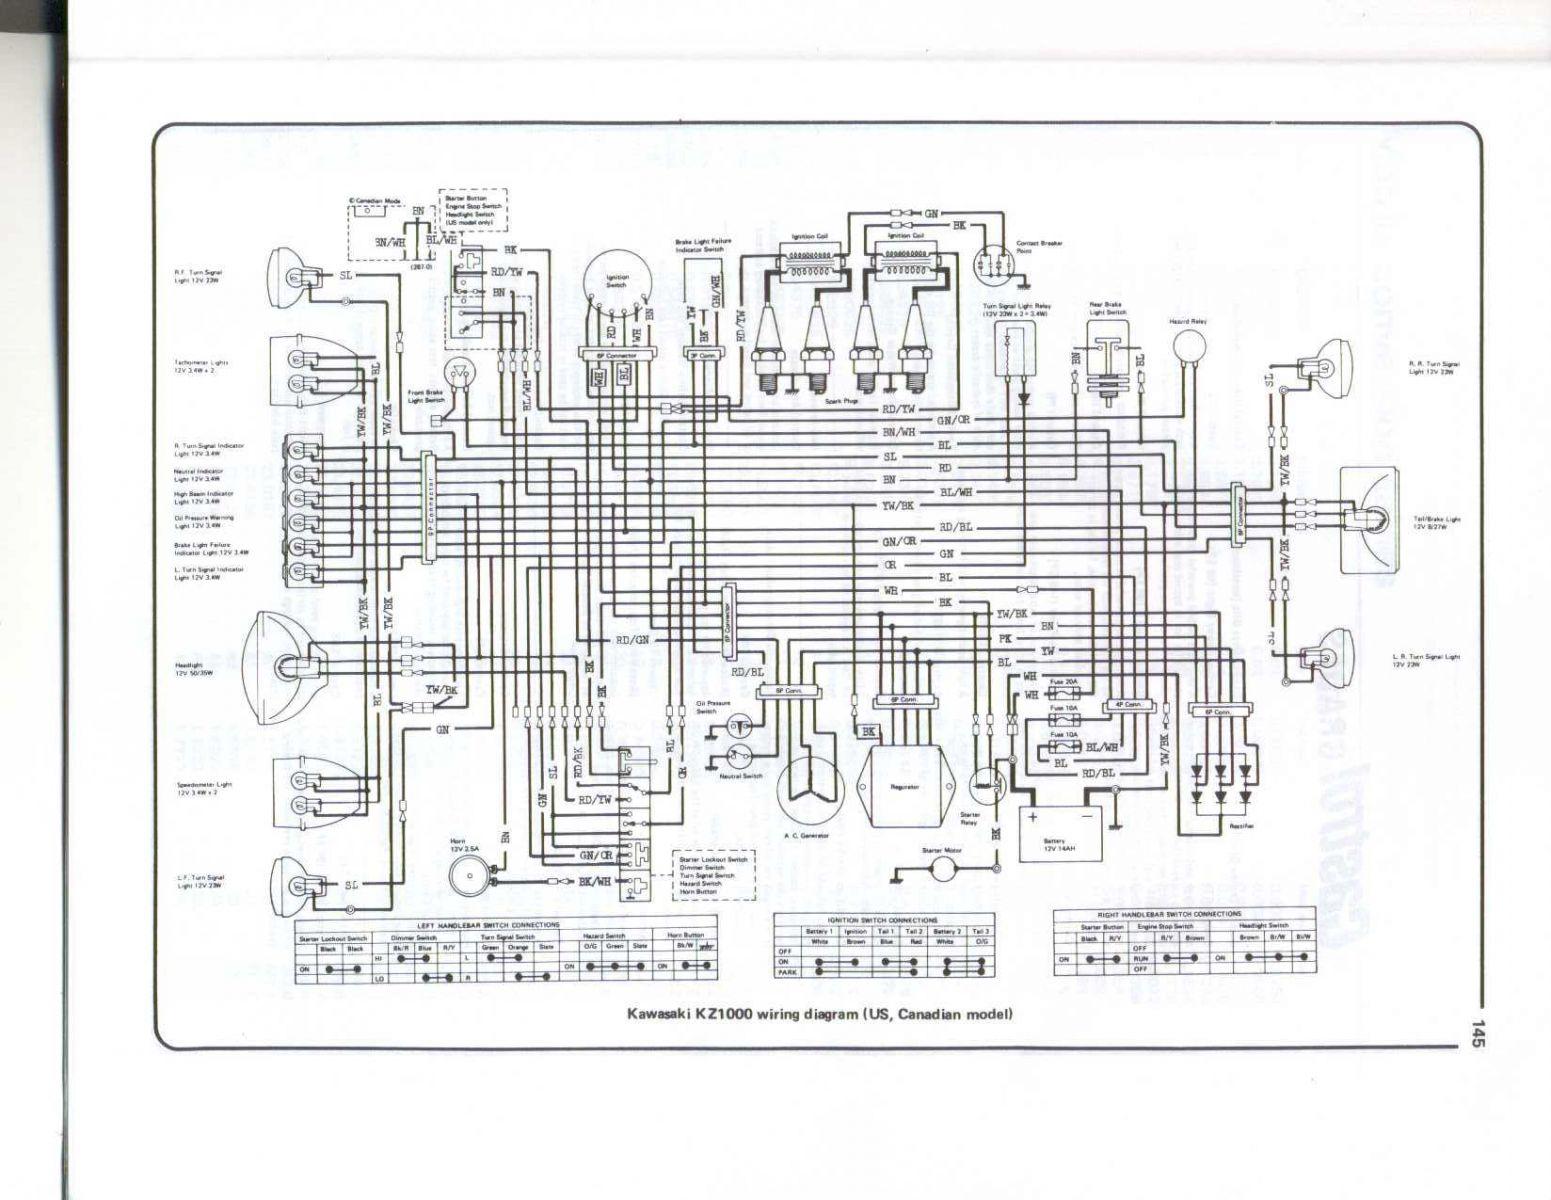 kz1000 wiring diagram picture